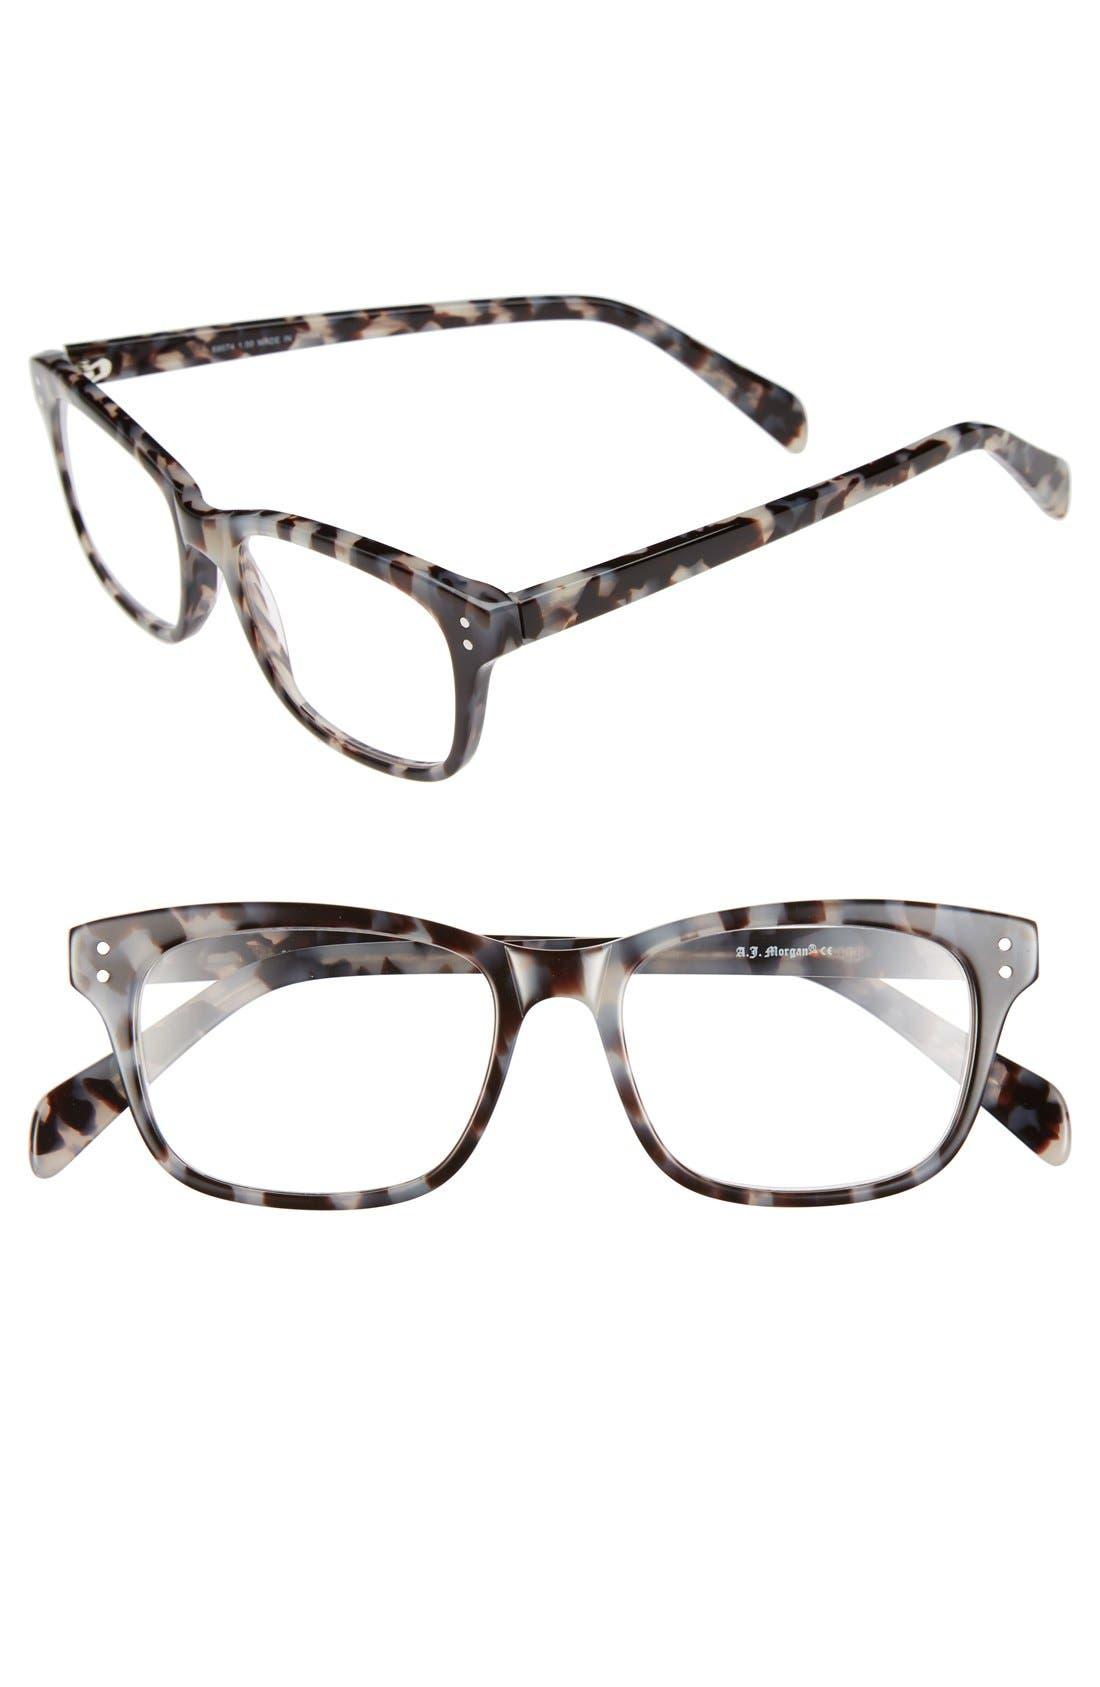 Main Image - A.J. Morgan 'Finn' 48mm Reading Glasses